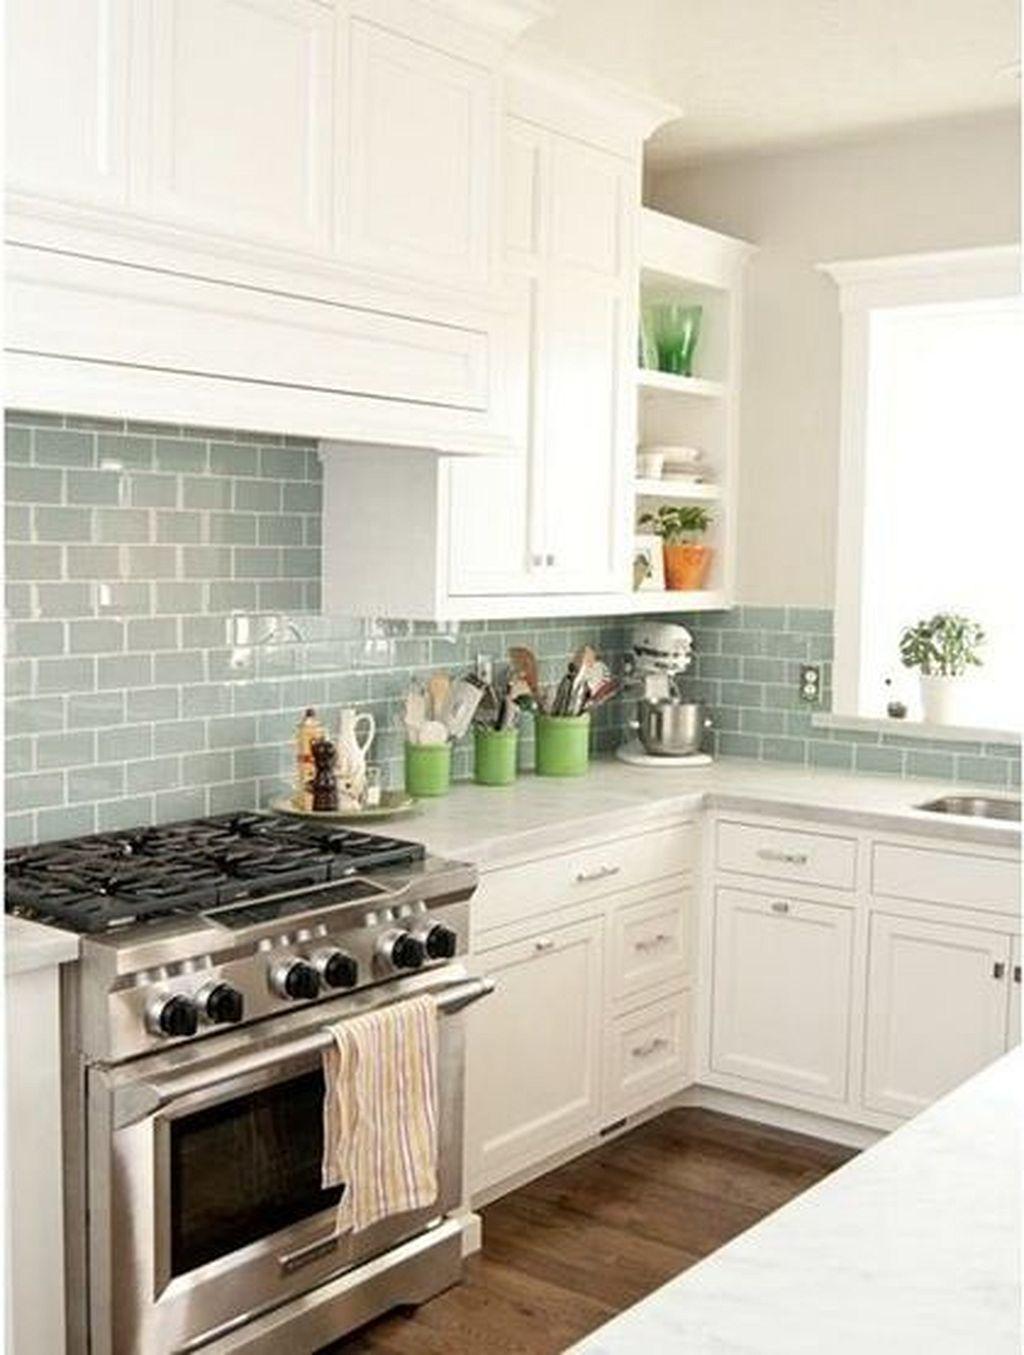 kitchen tile backsplash ideas with granite countertops difference rh pinterest es Kitchen Backsplash with Dark Granite Countertops Quartz Kitchen Countertops with Backsplash Ideas